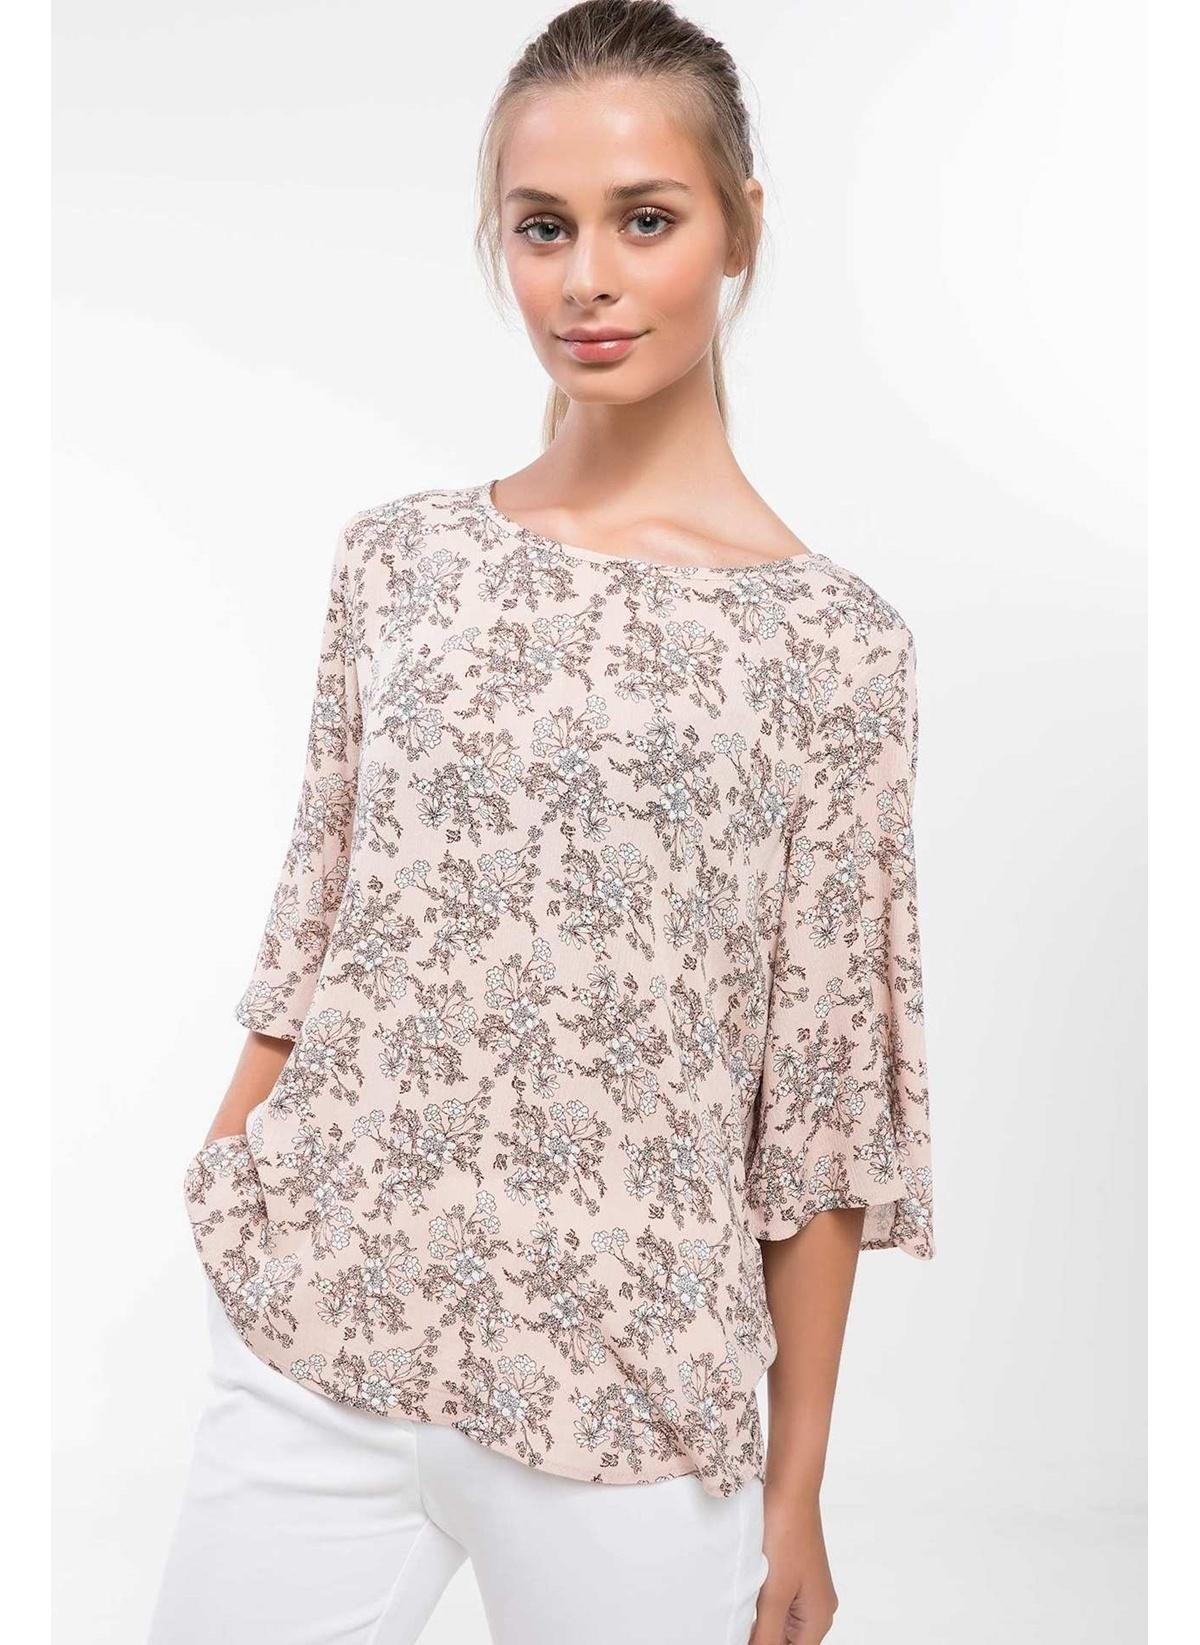 Defacto Kolları Volan Detaylı Çiçek Desenli Bluz J7078az18hspn223bluz – 39.99 TL